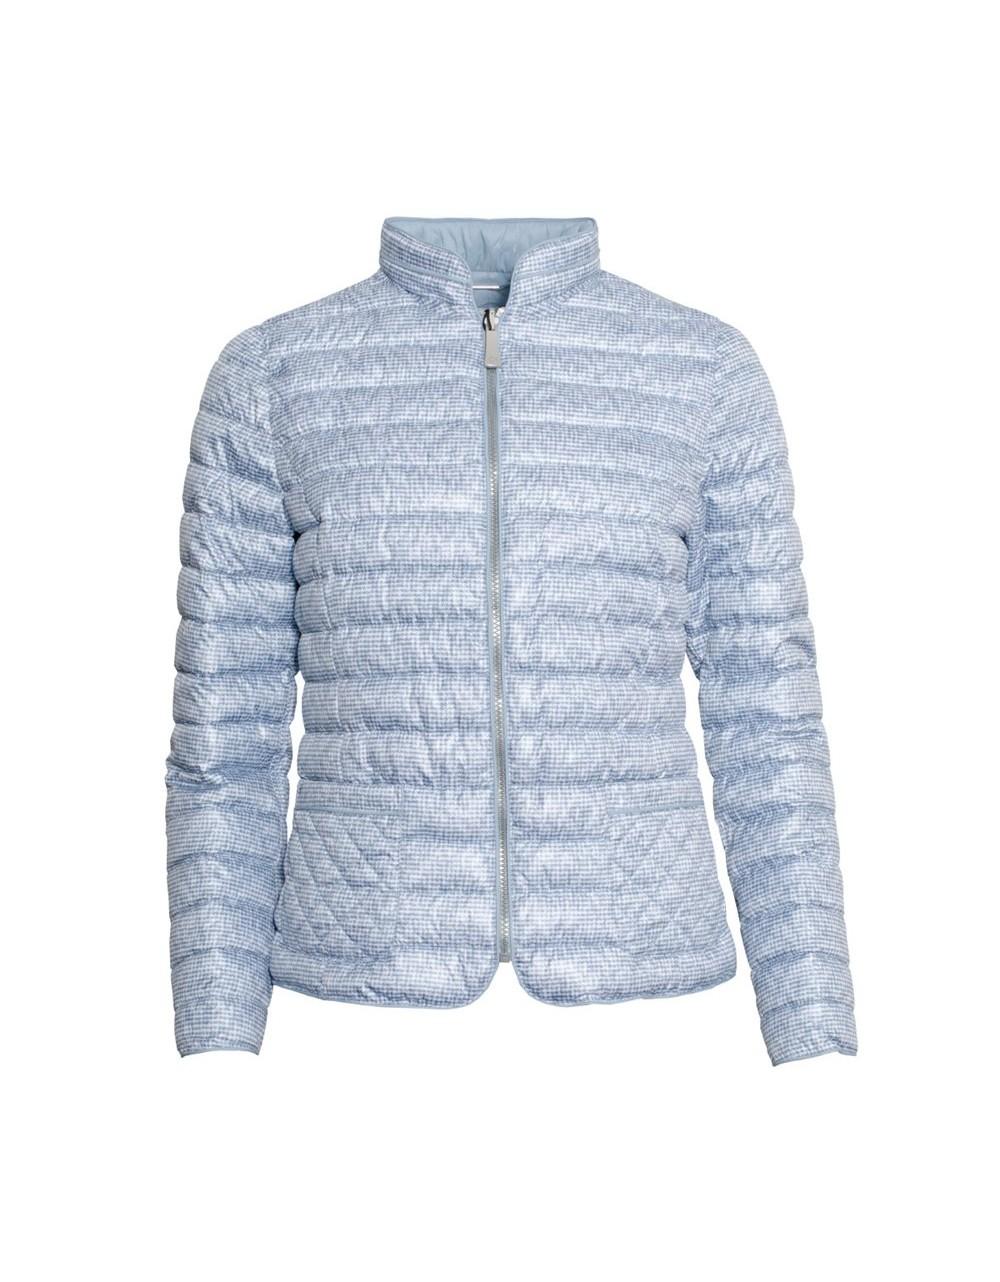 Lebek Reversible Light Quilted Jacket Outerwear Irish Handcrafts -1